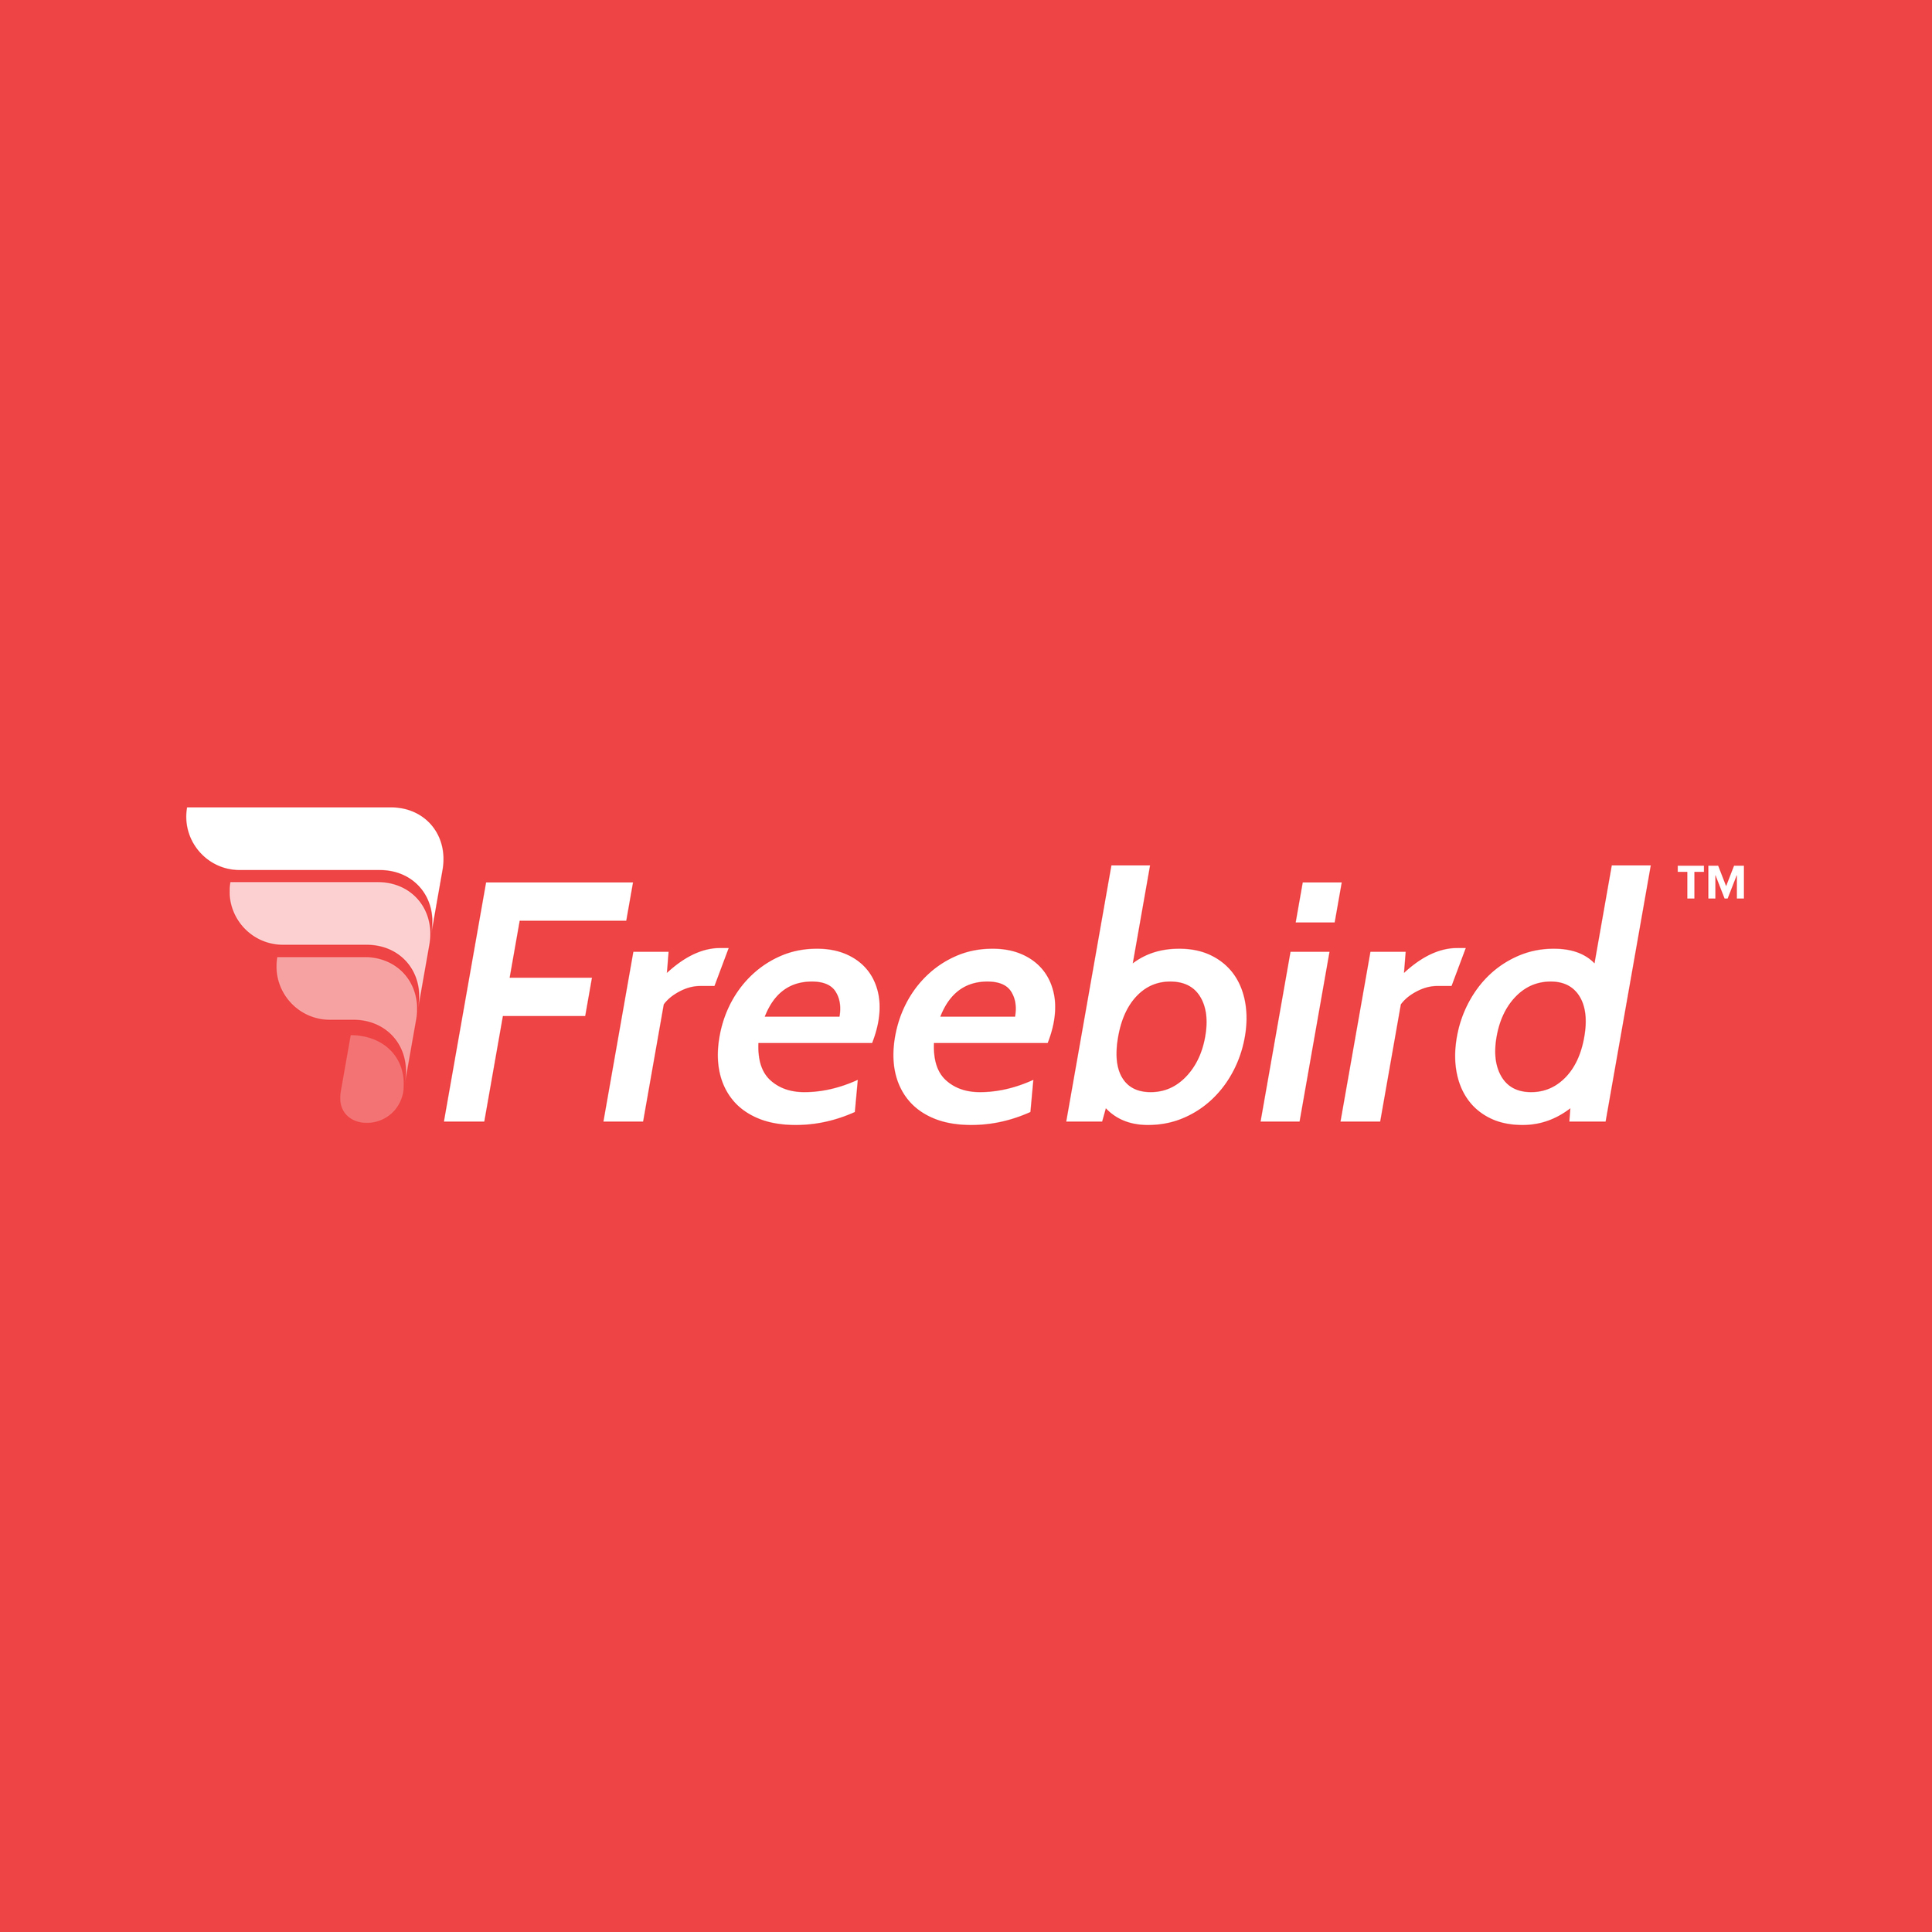 Freebird-full-logo-2MB.jpg